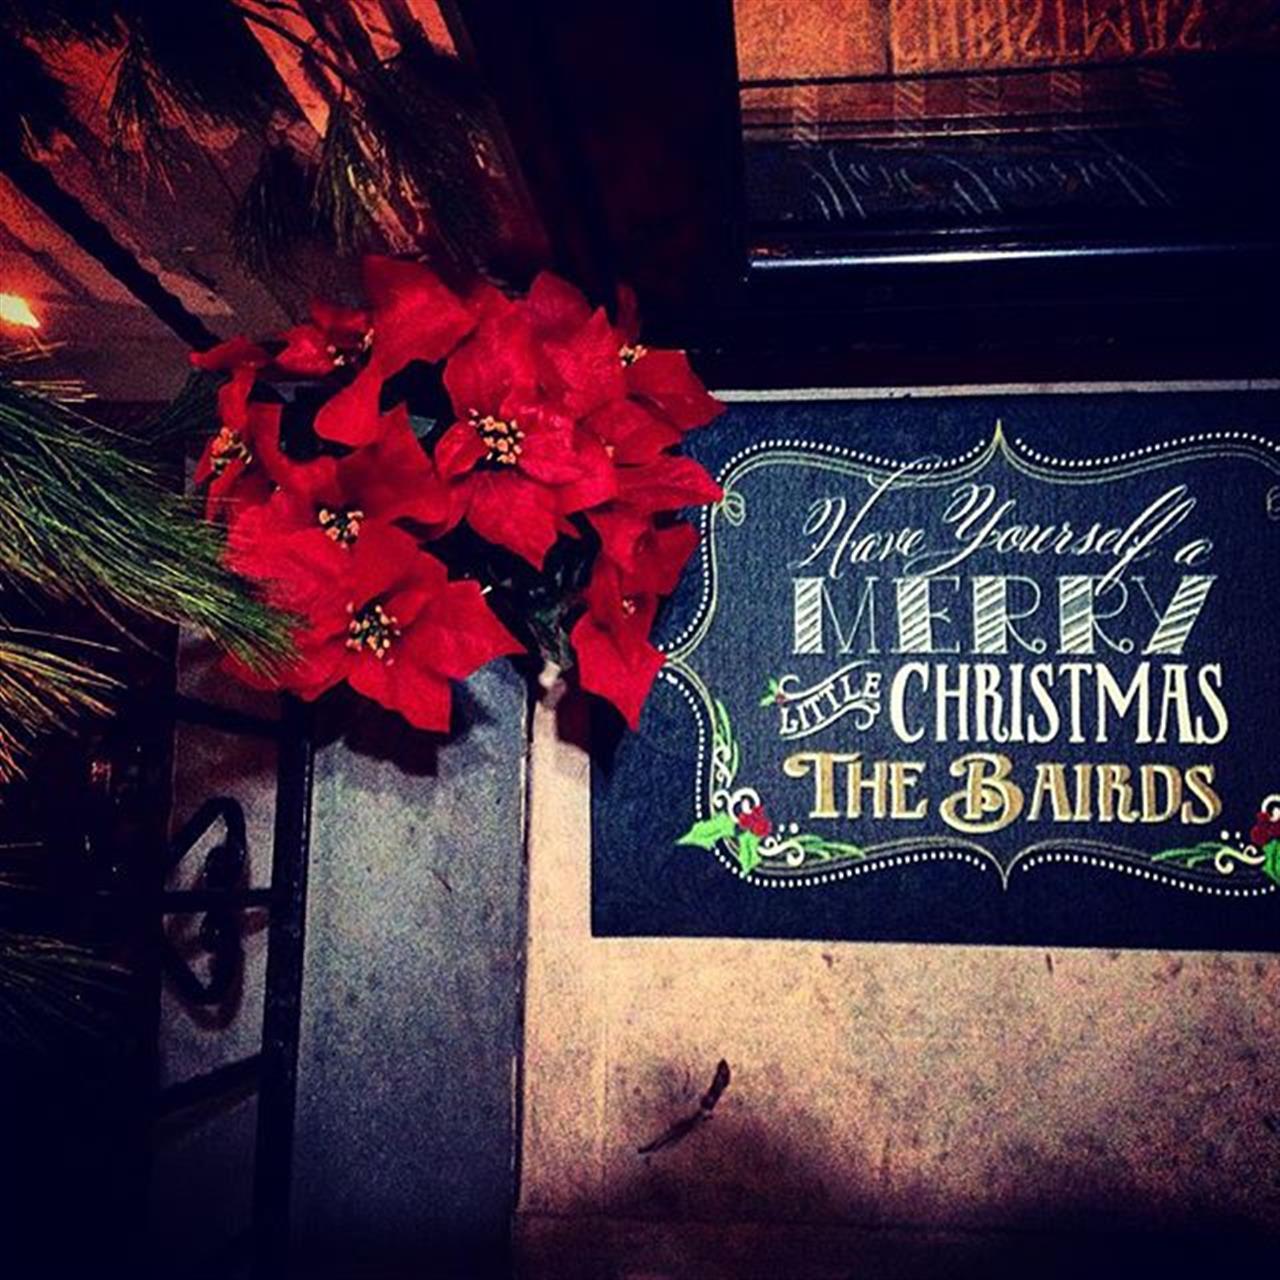 Christmas countdown....4 days!!!???????#family #love #bairdhalstead #halsteadproperty #exploreyourhood #leadingrelocal #montclairnj #glenridge #cedargrove #peace#christmas